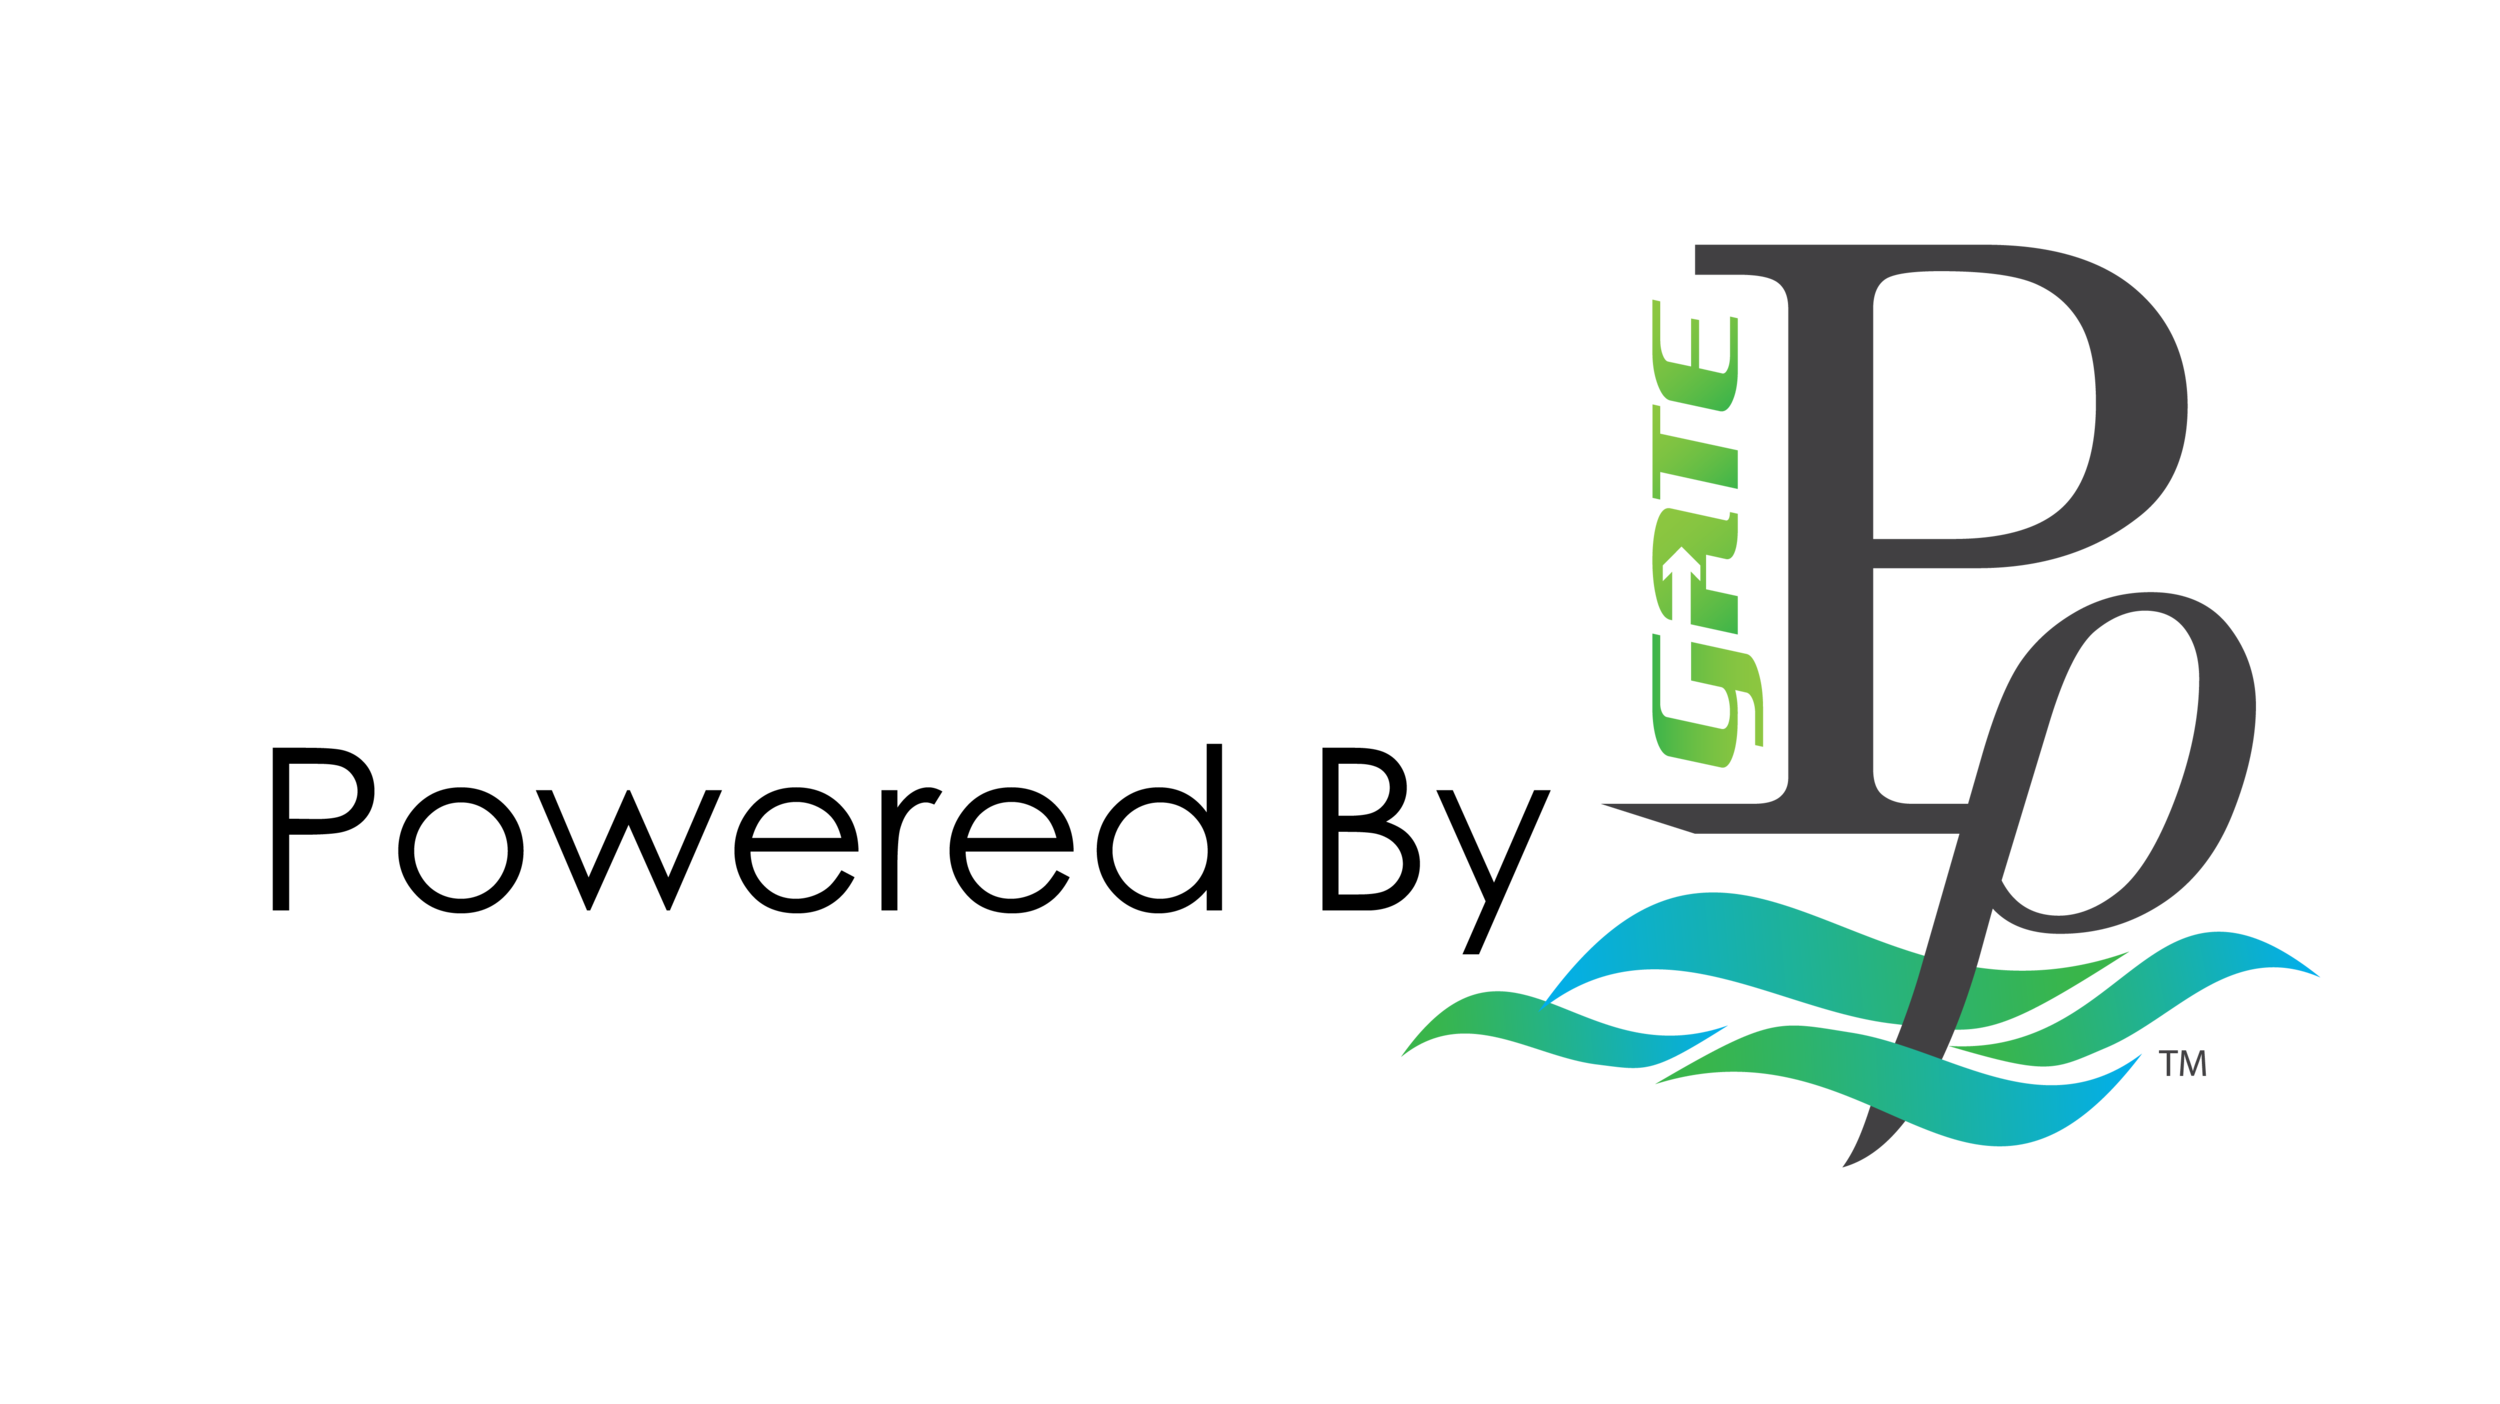 Logo - Prho 2017__Powered by Prho.png